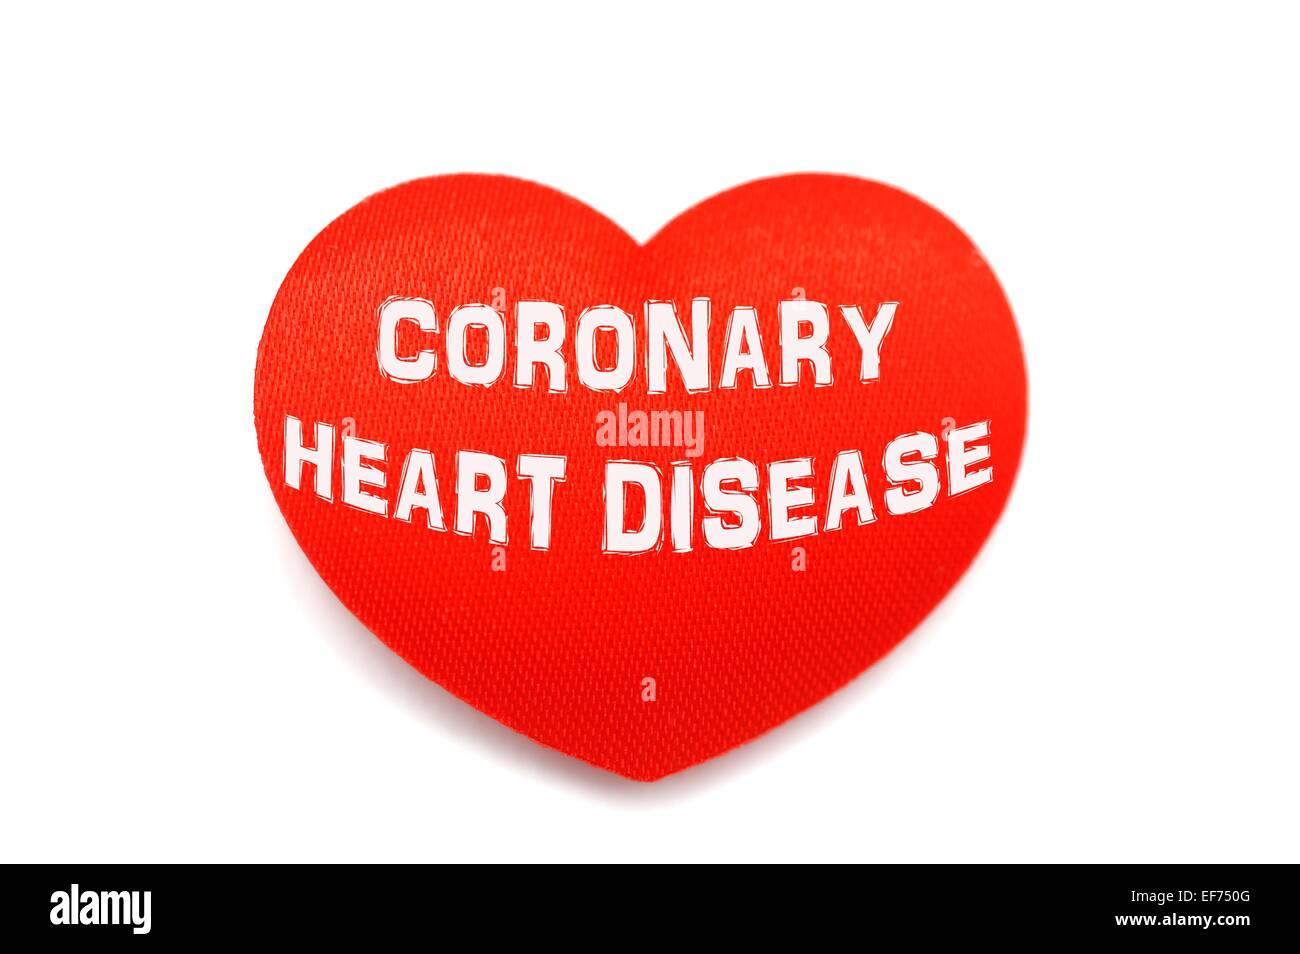 coronary heart disease - Stock Image